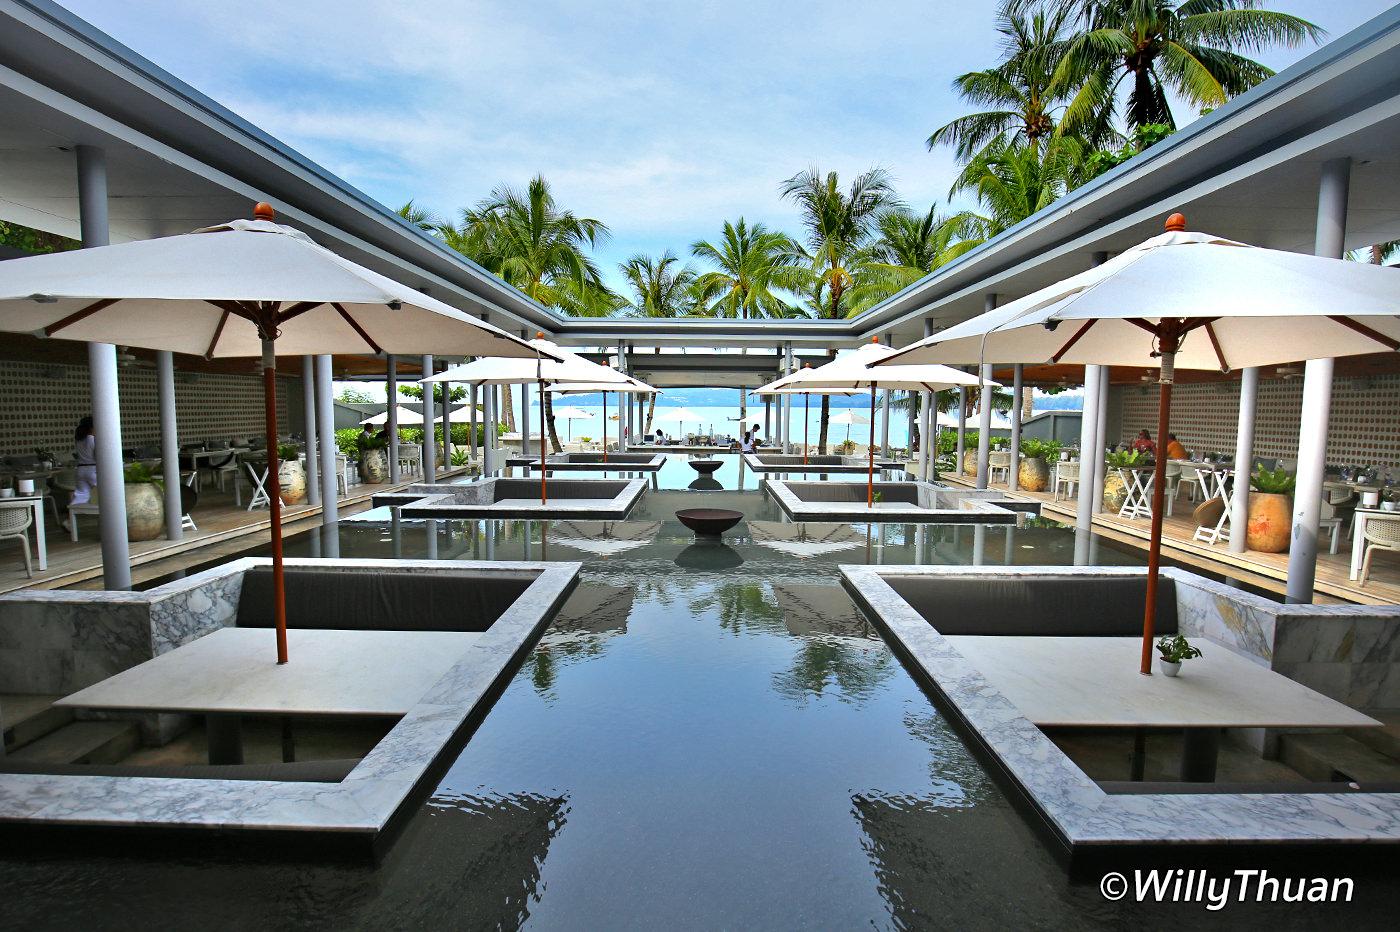 Palm Seaside Restaurant and Lounge on Bangtao Beach